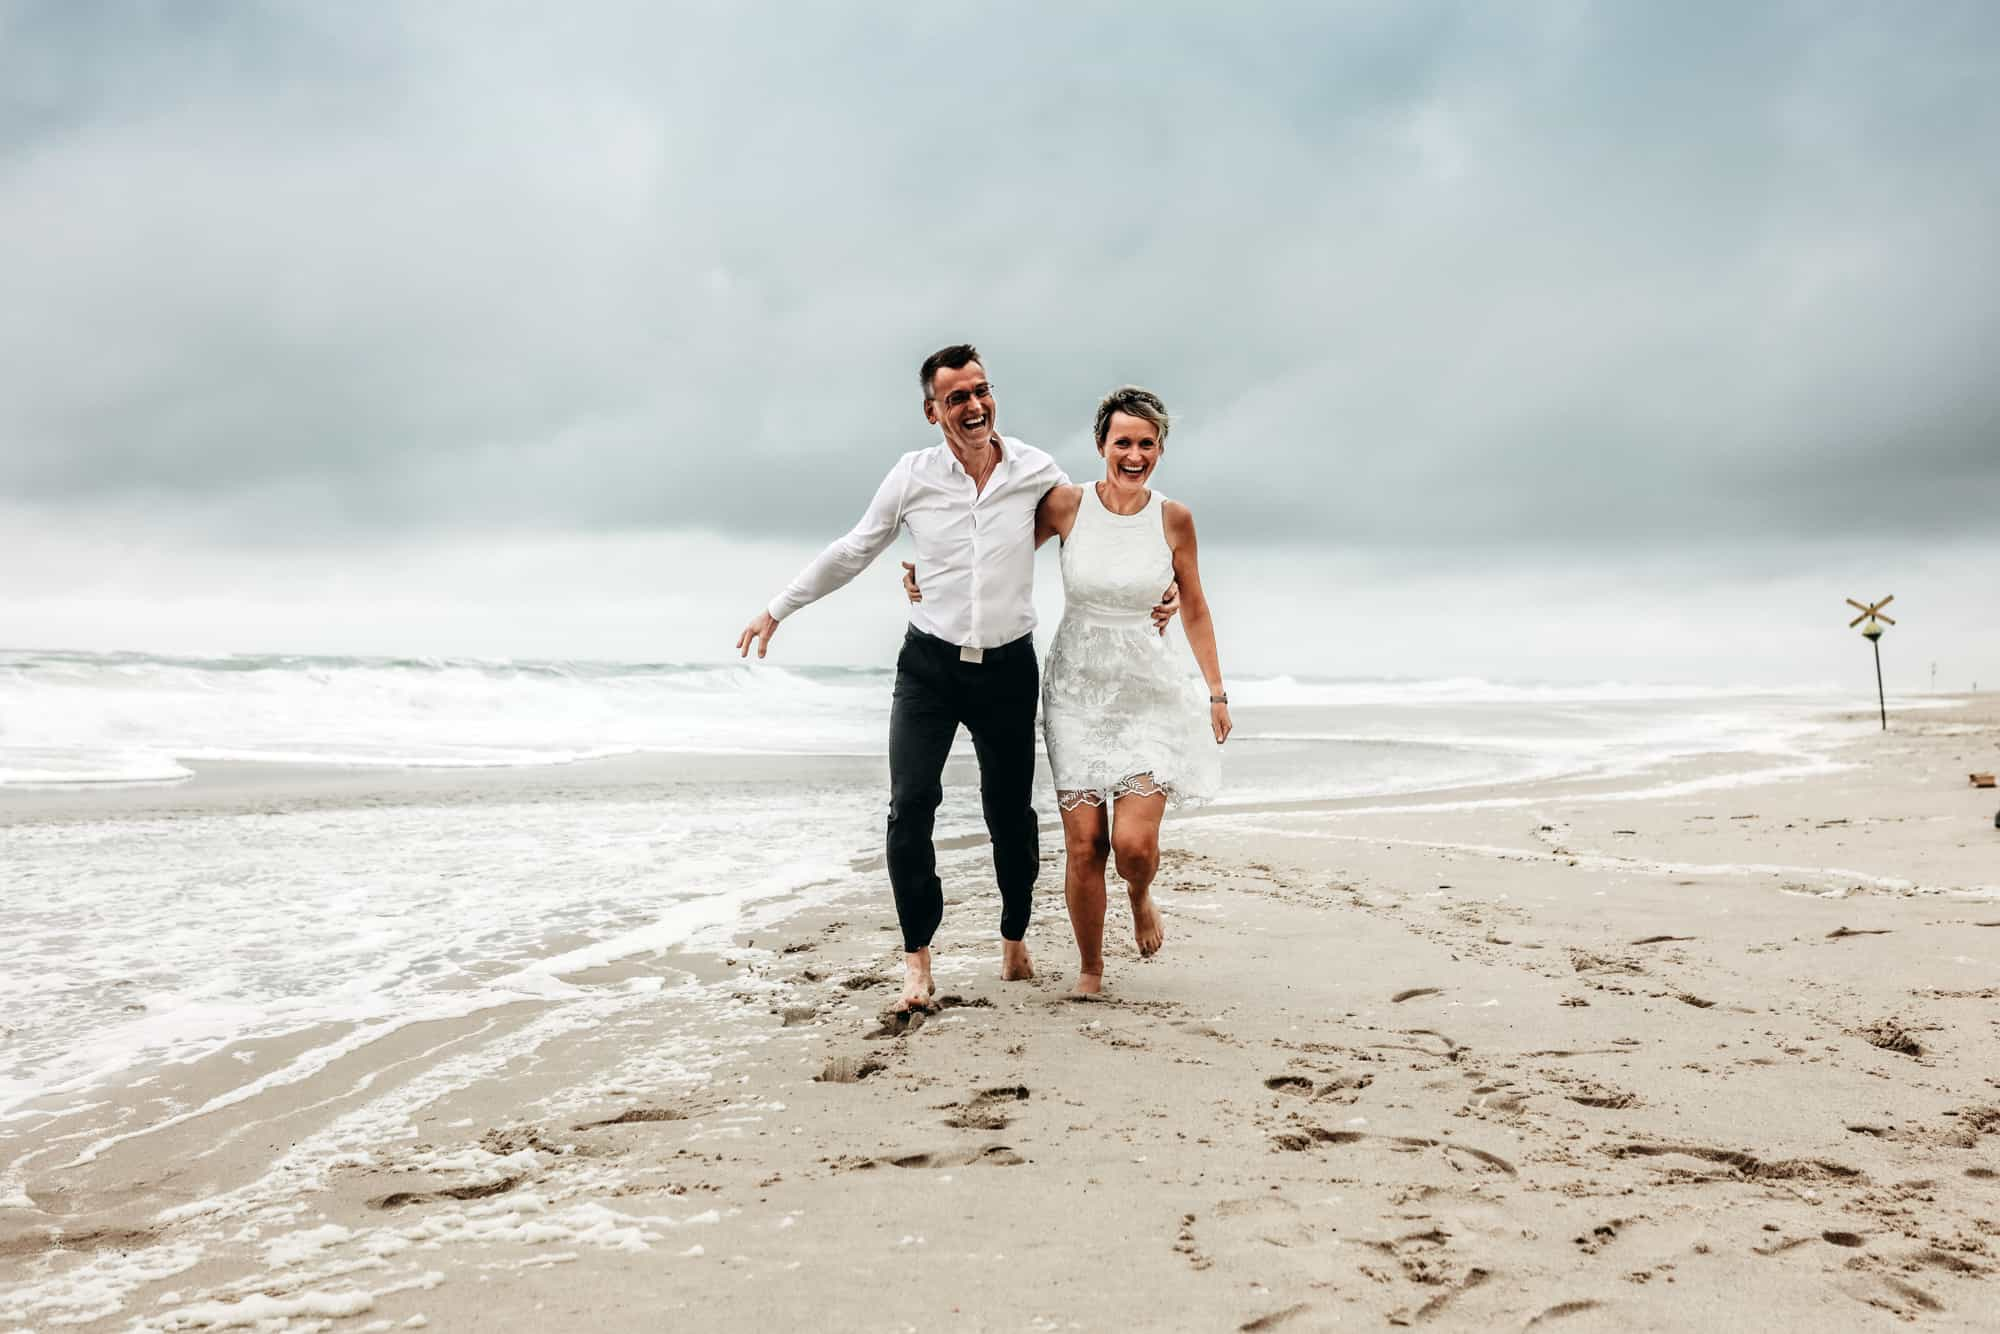 Sylt Fotograf Heiraten auf Sylt Hochzeitsfotograf Sylt